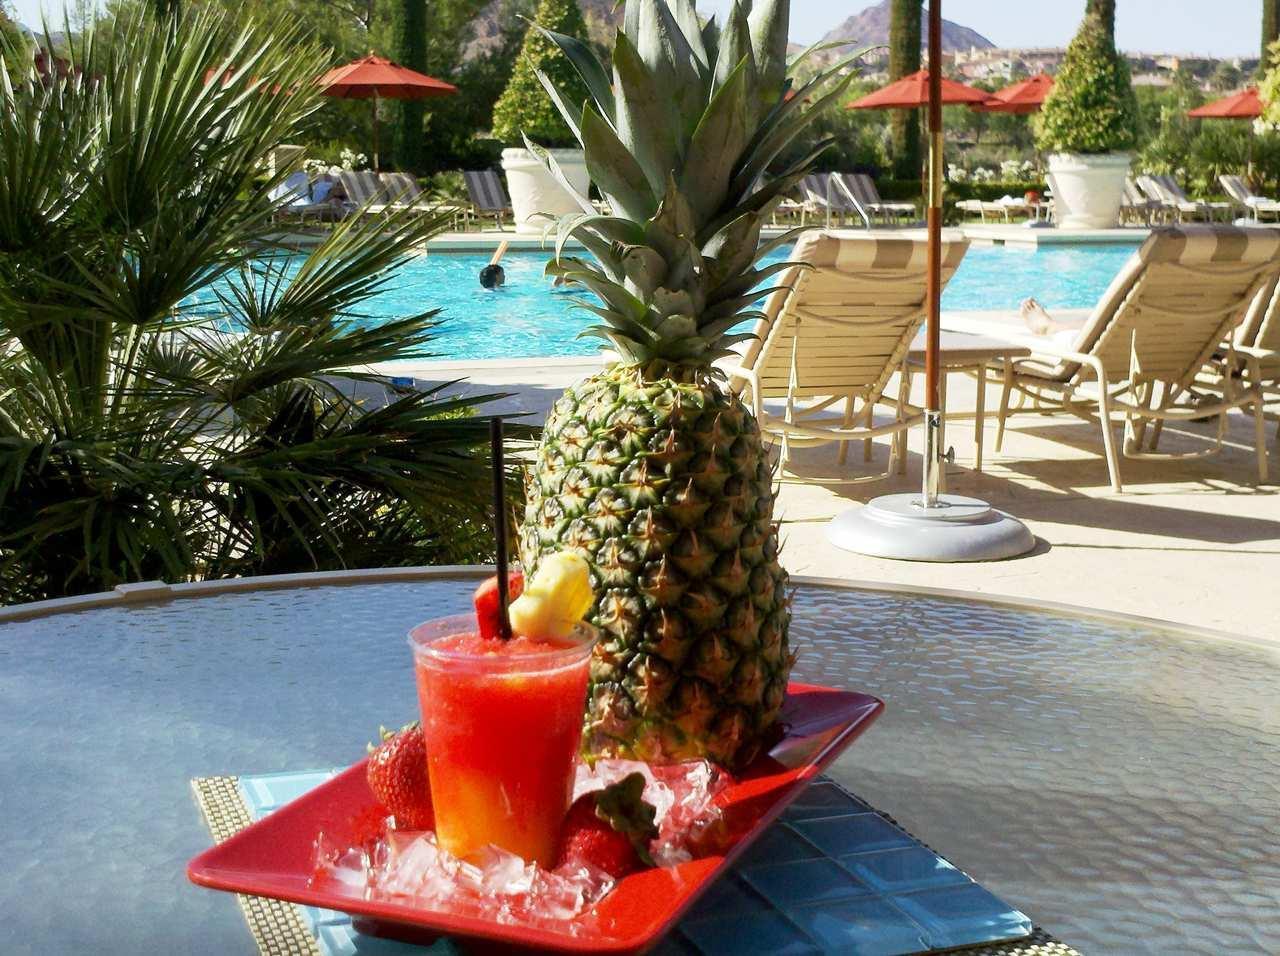 Hilton Lake Las Vegas Resort & Spa image 6